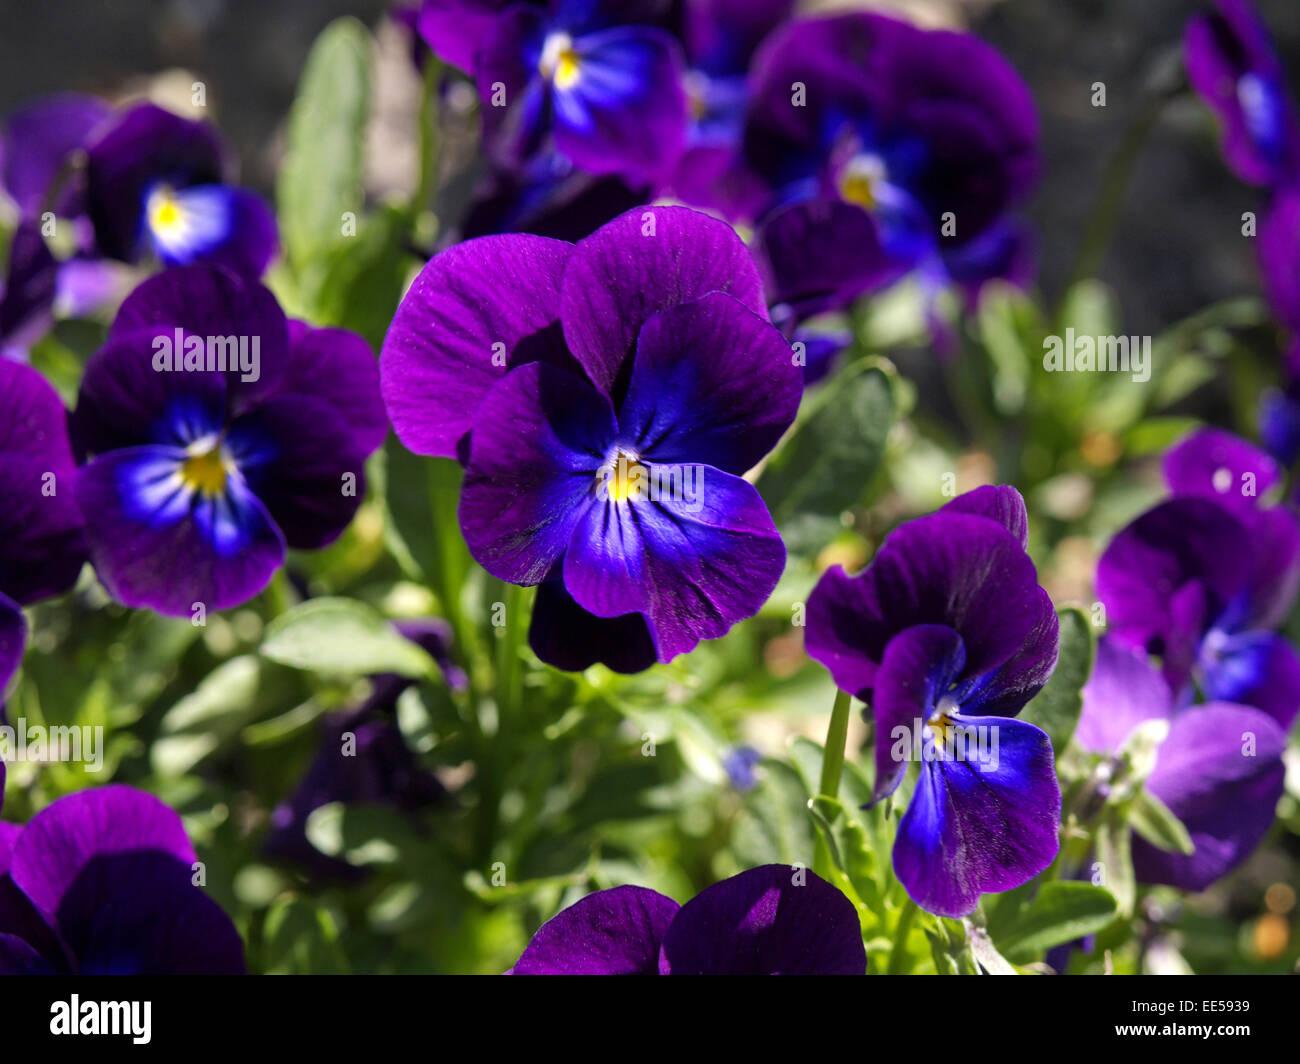 Stiefmuetterchen, Viola spec, Blueten, lila, Zierpflanzen, Wildpflanzen, Pflanzen, Blumen, Zierblumen, Veilchengewaechse, - Stock Image